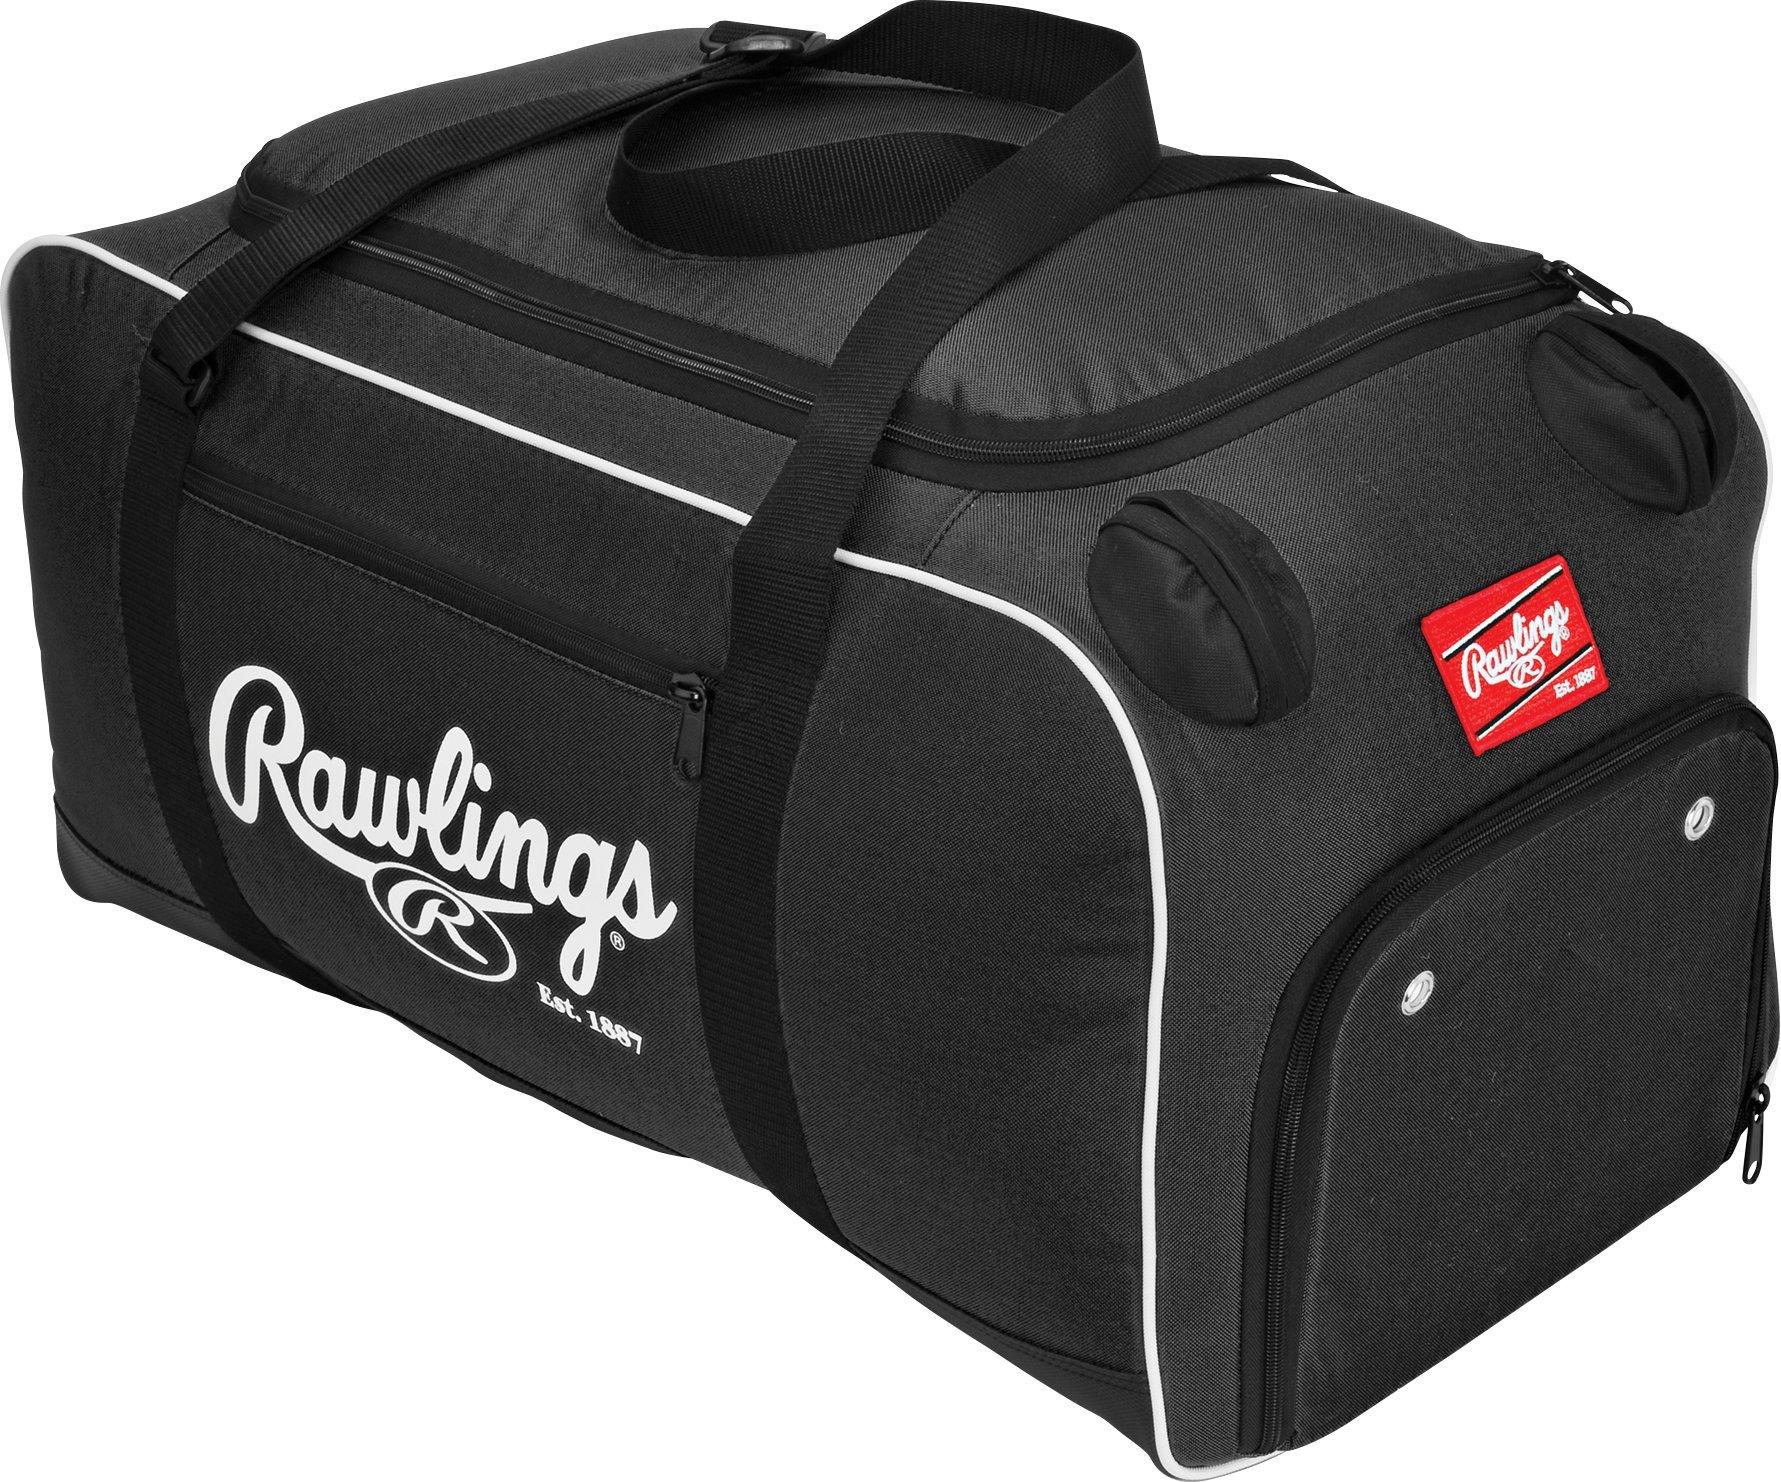 Rawlings Covert Player Duffle Bag (EA) by Rawlings